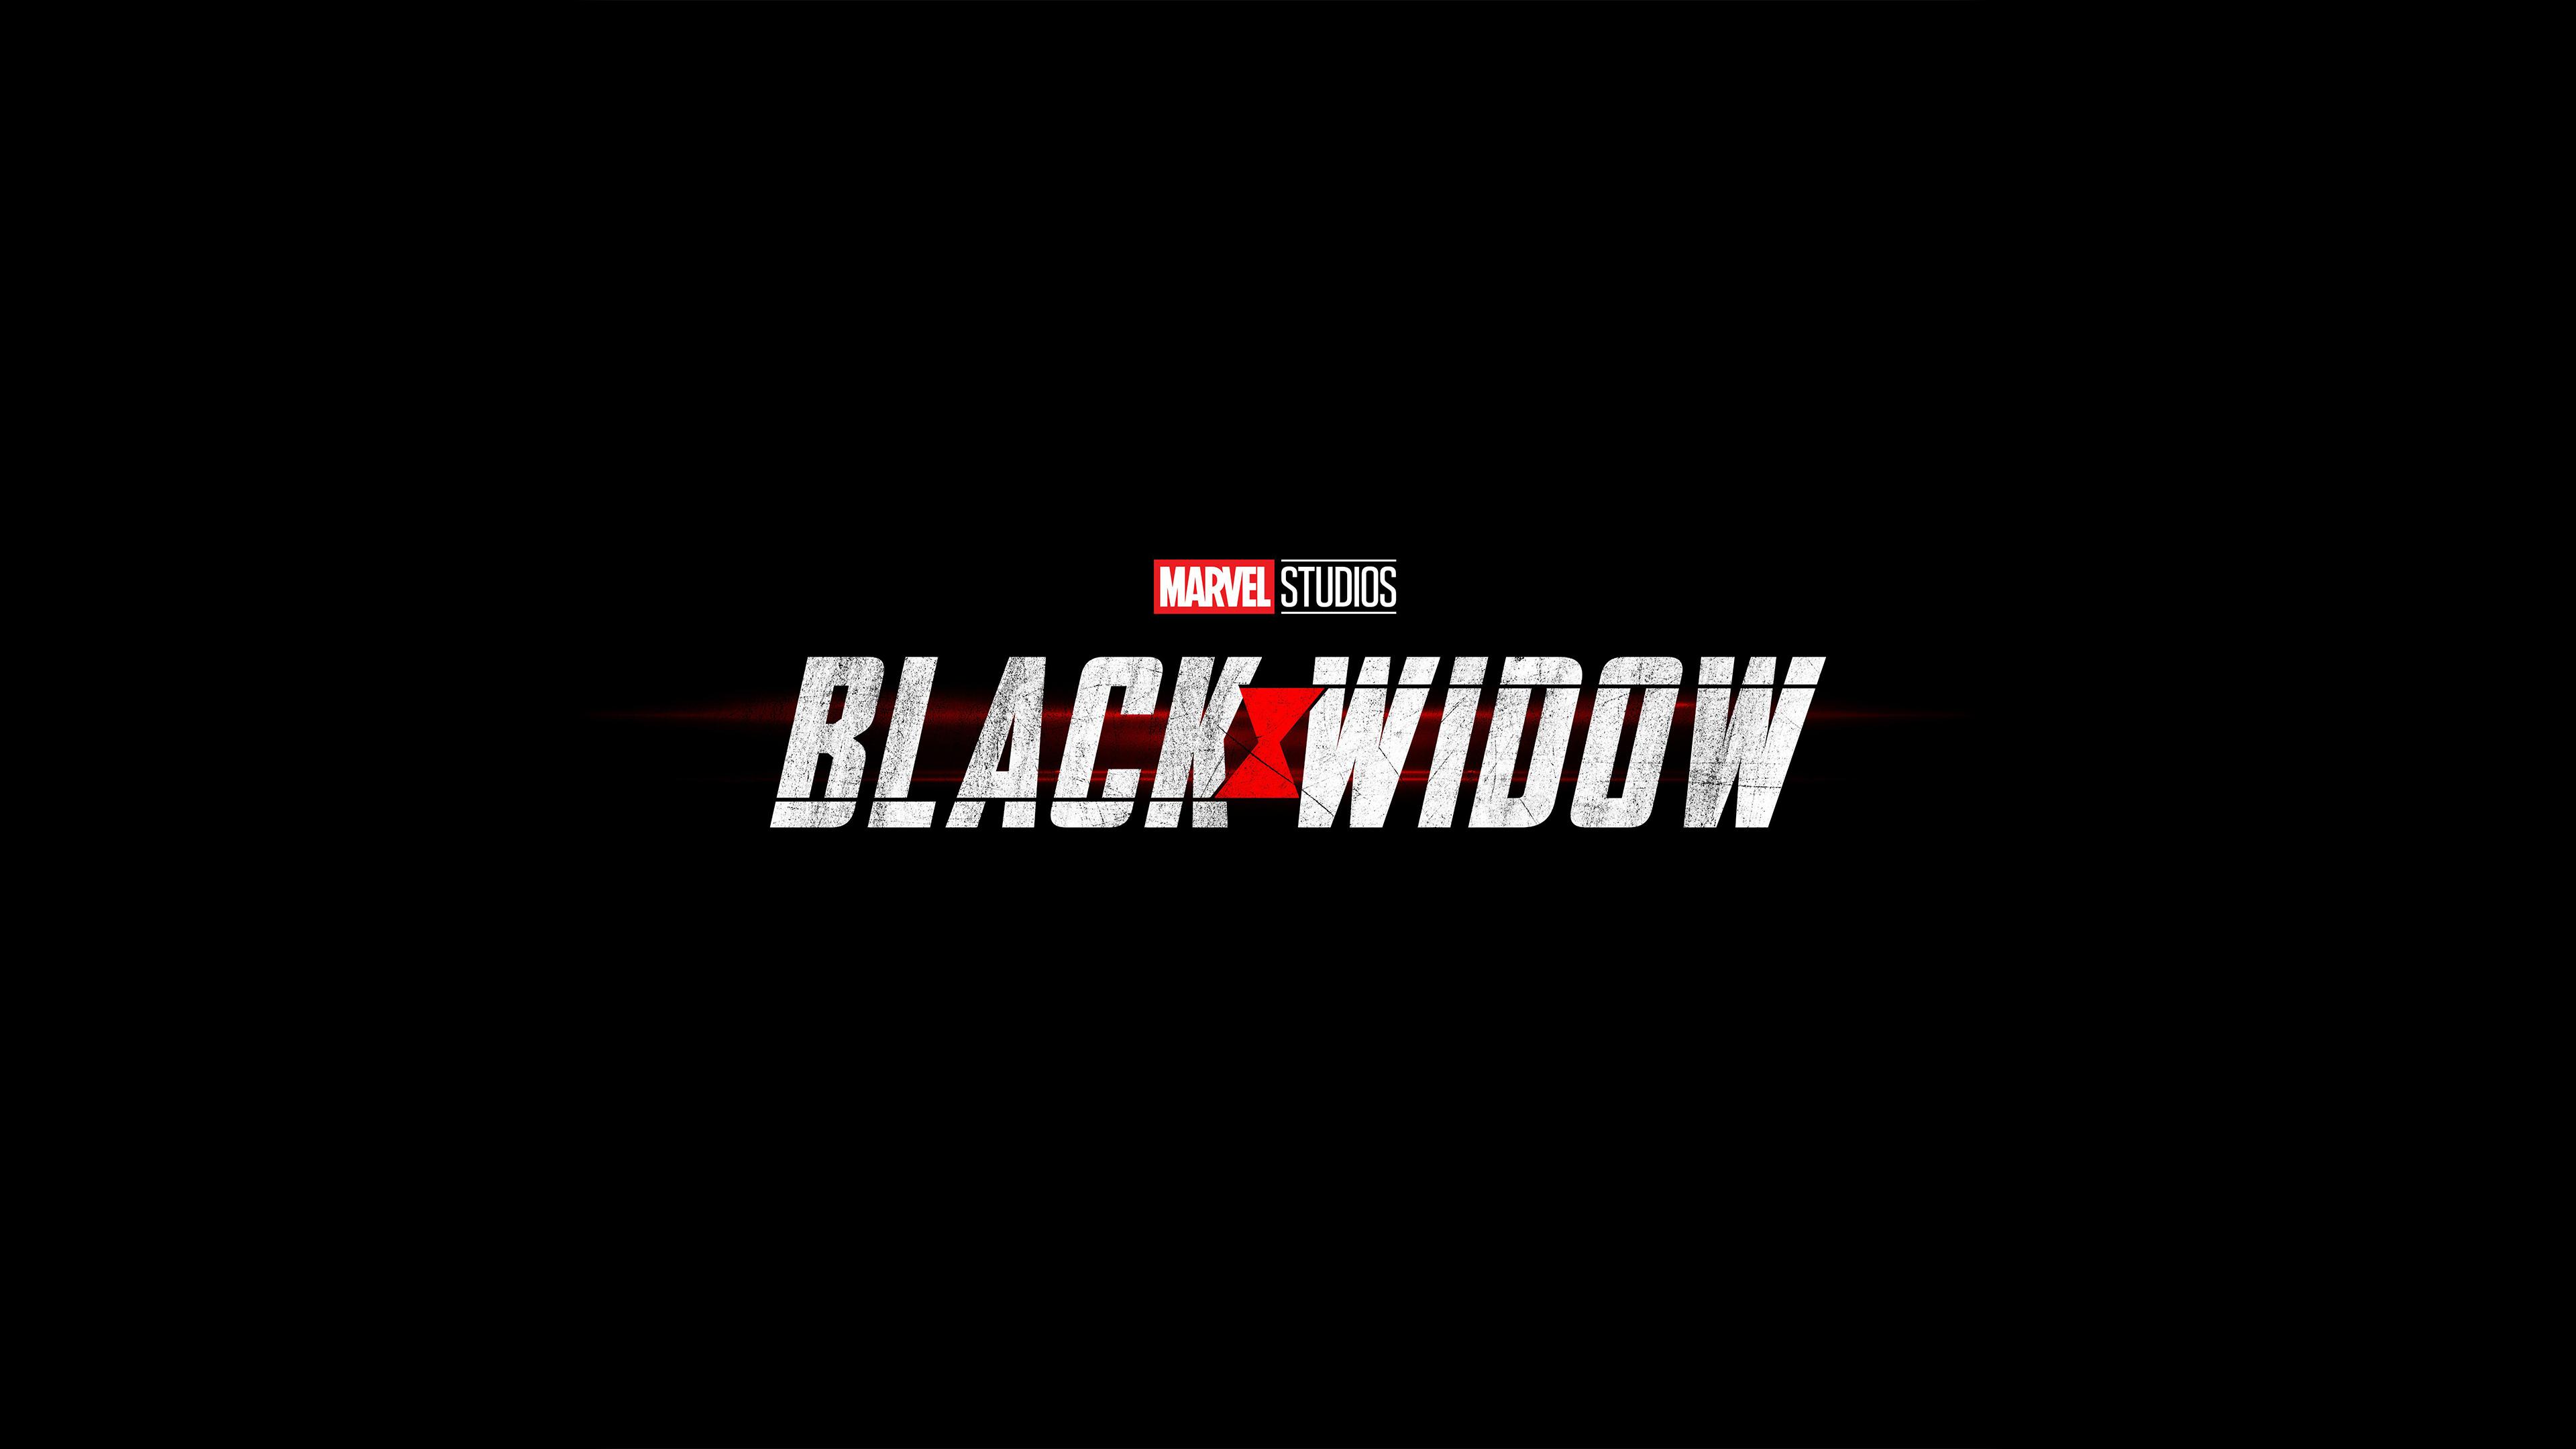 Download Black Widow 2020 Wallpaper Cikimm Com